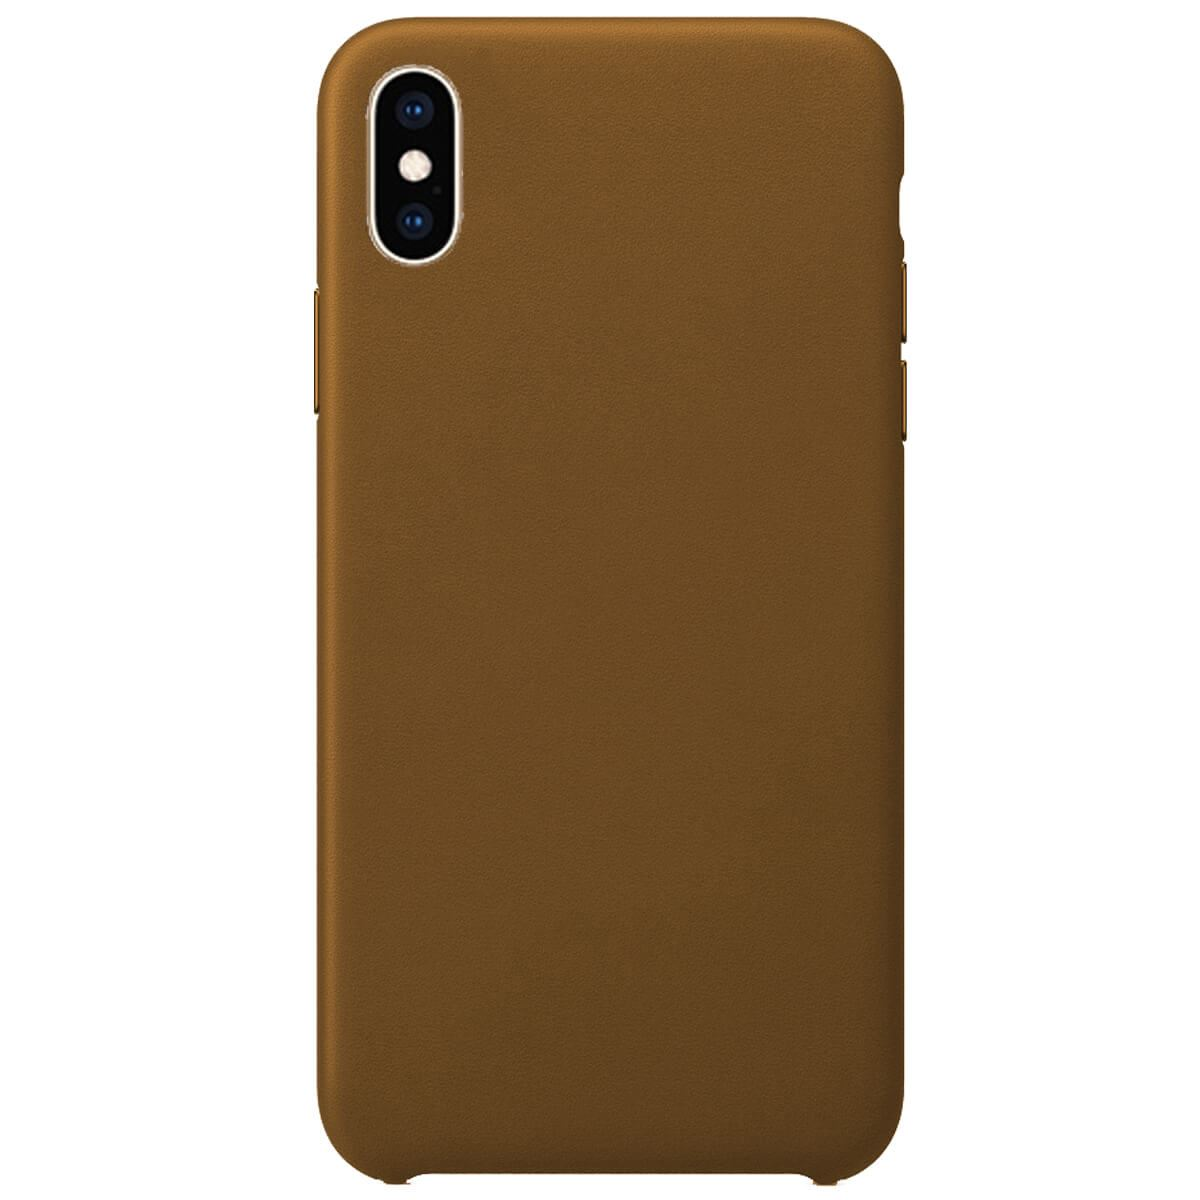 Leather-Slim-Case-Apple-iPhone-10-8-7-Plus-6s-5-Original-PU-Soft-Silicone-Cover thumbnail 12